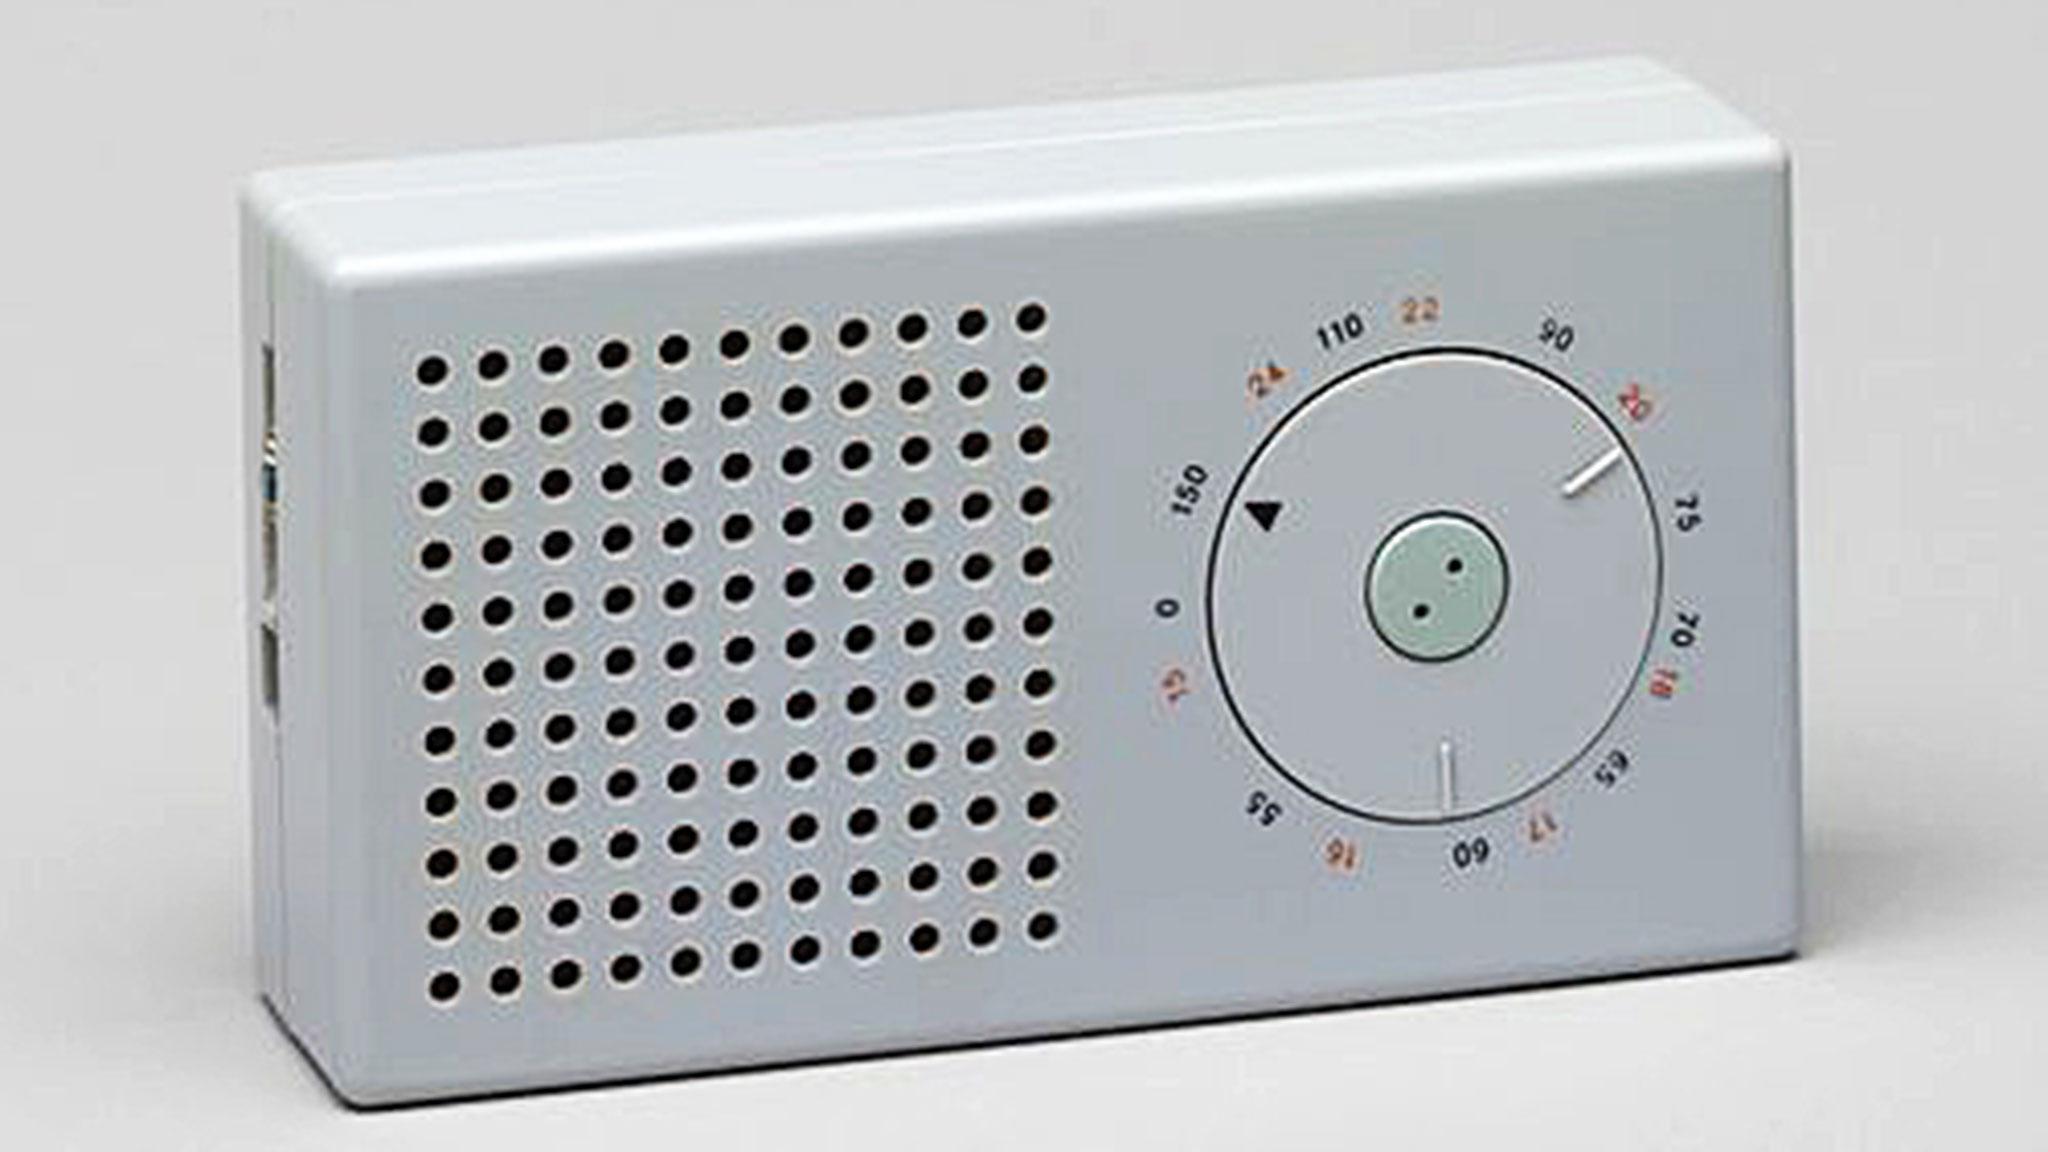 design classic dieter rams t3 radio. Black Bedroom Furniture Sets. Home Design Ideas